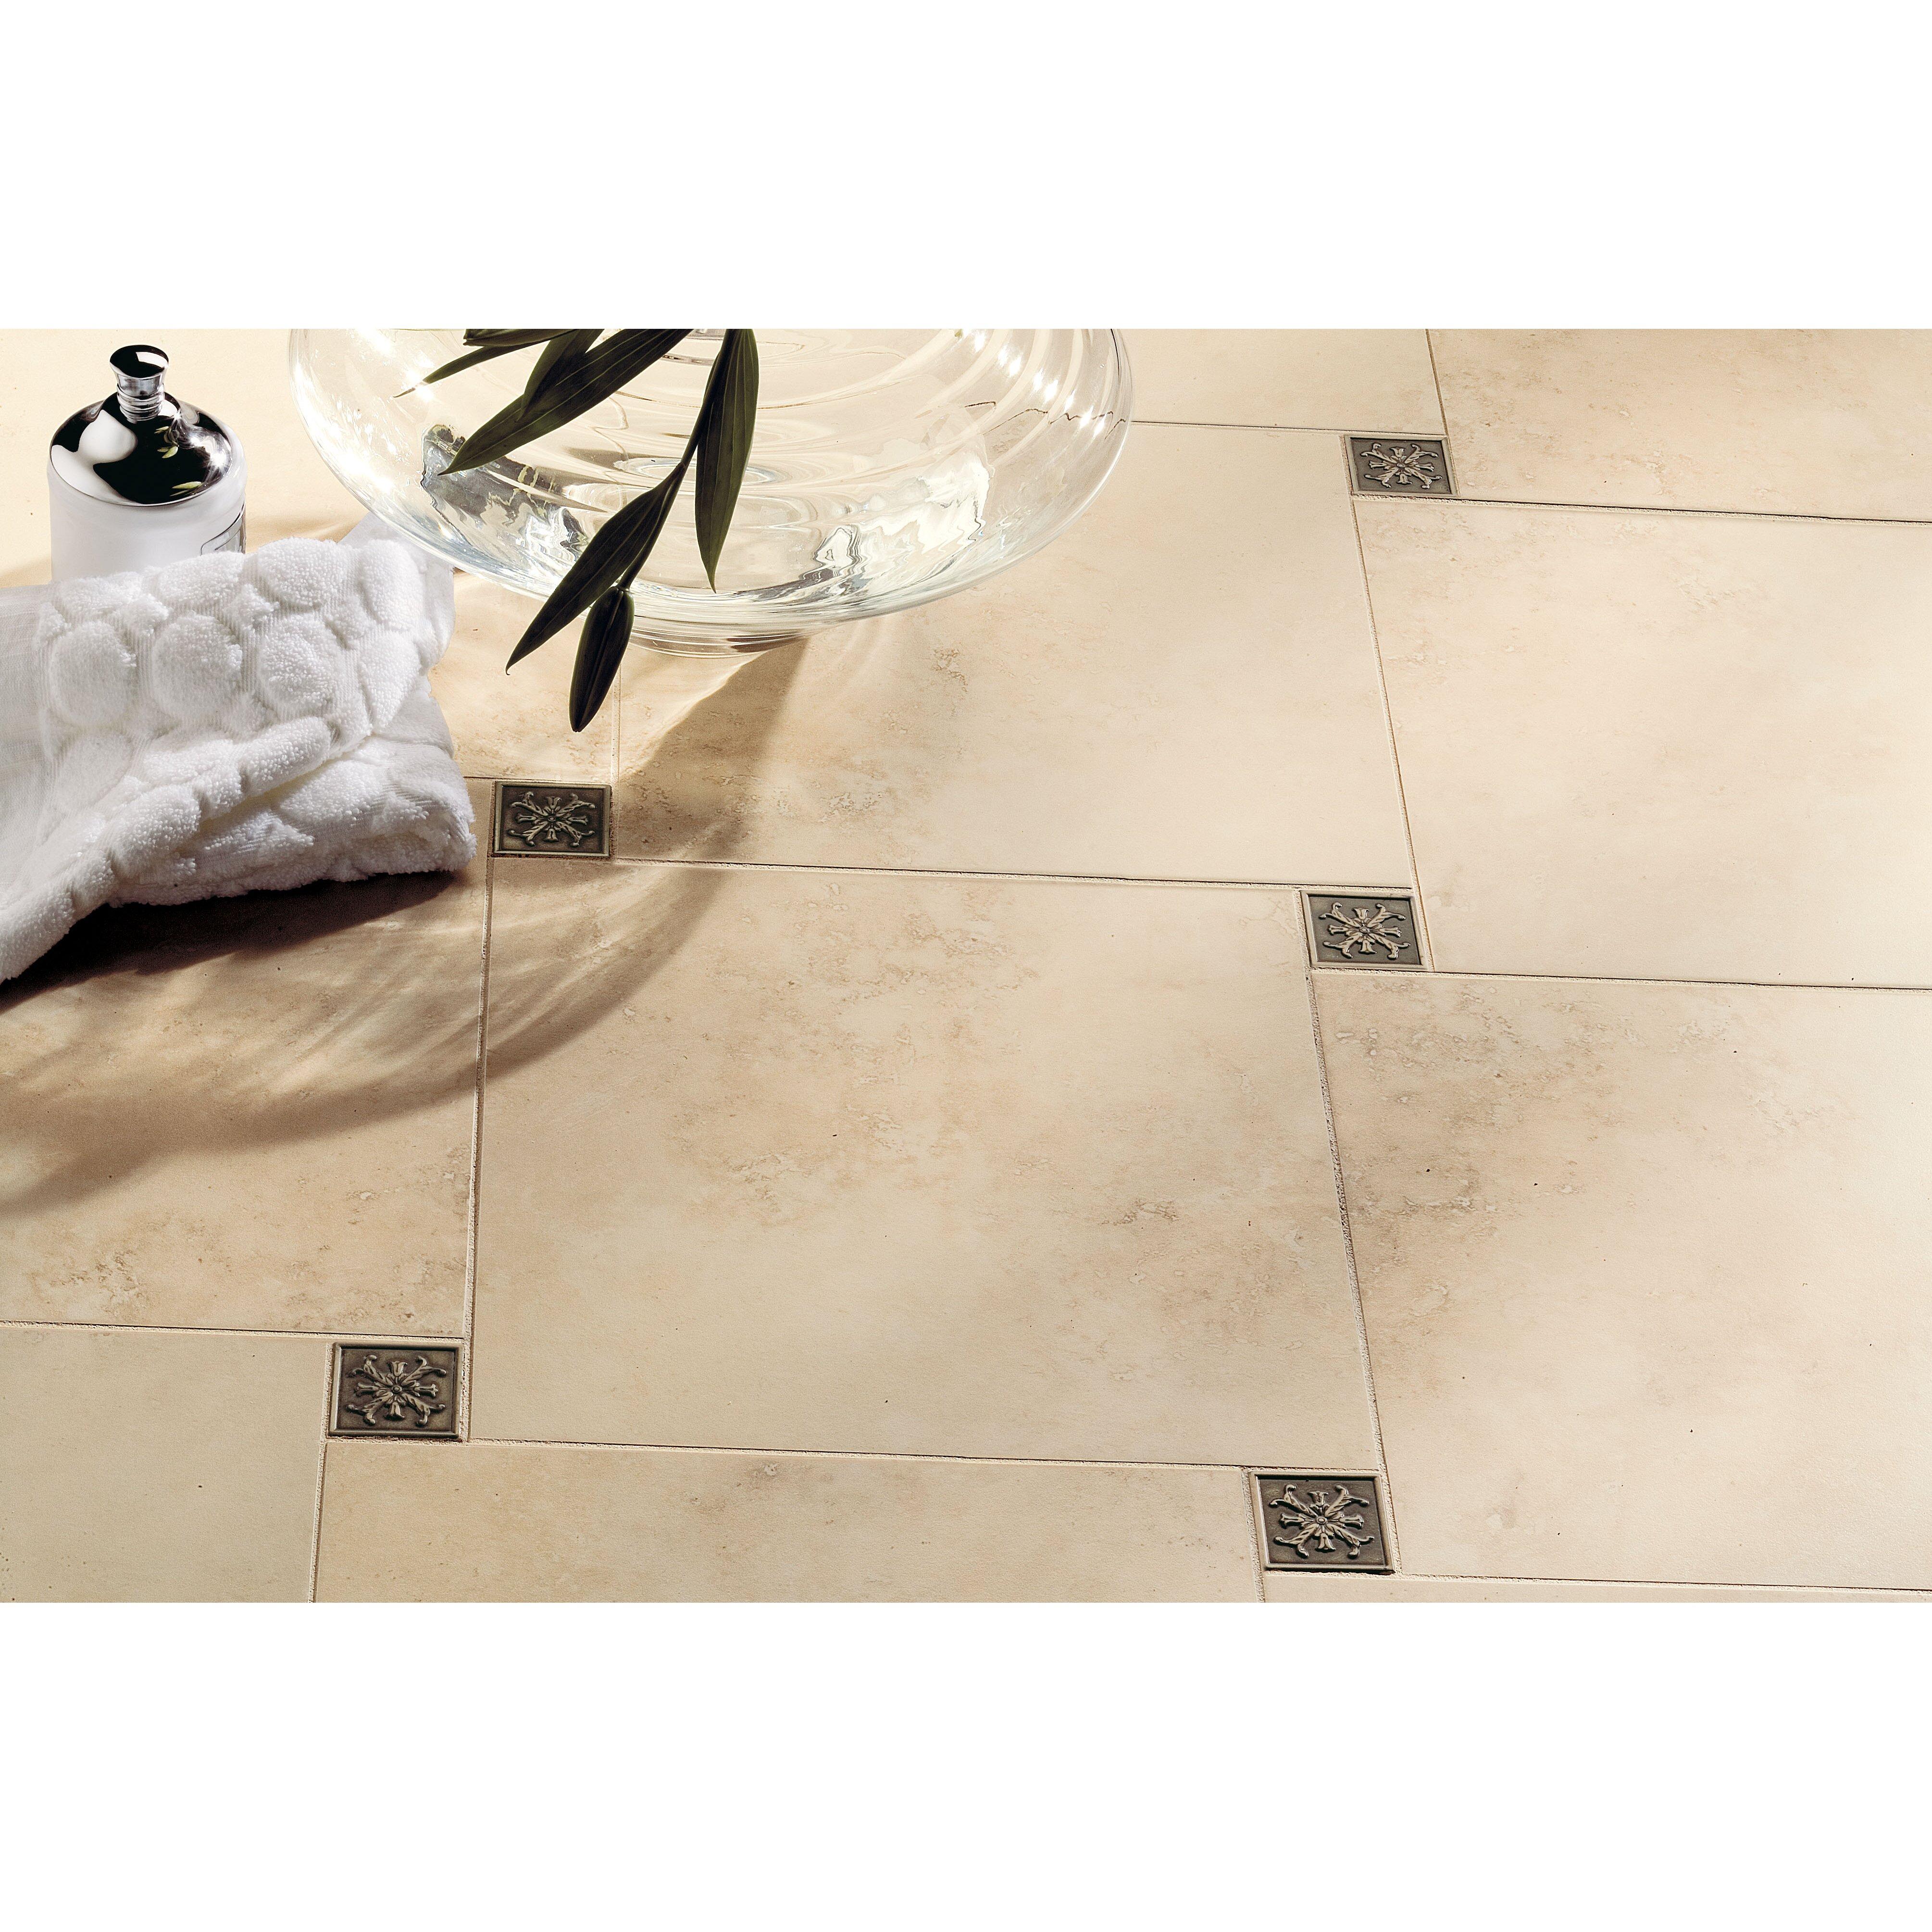 13x13 Marfil Chiaro Tile Mohawk Flooring Mirador X Floor Tile In Cameo